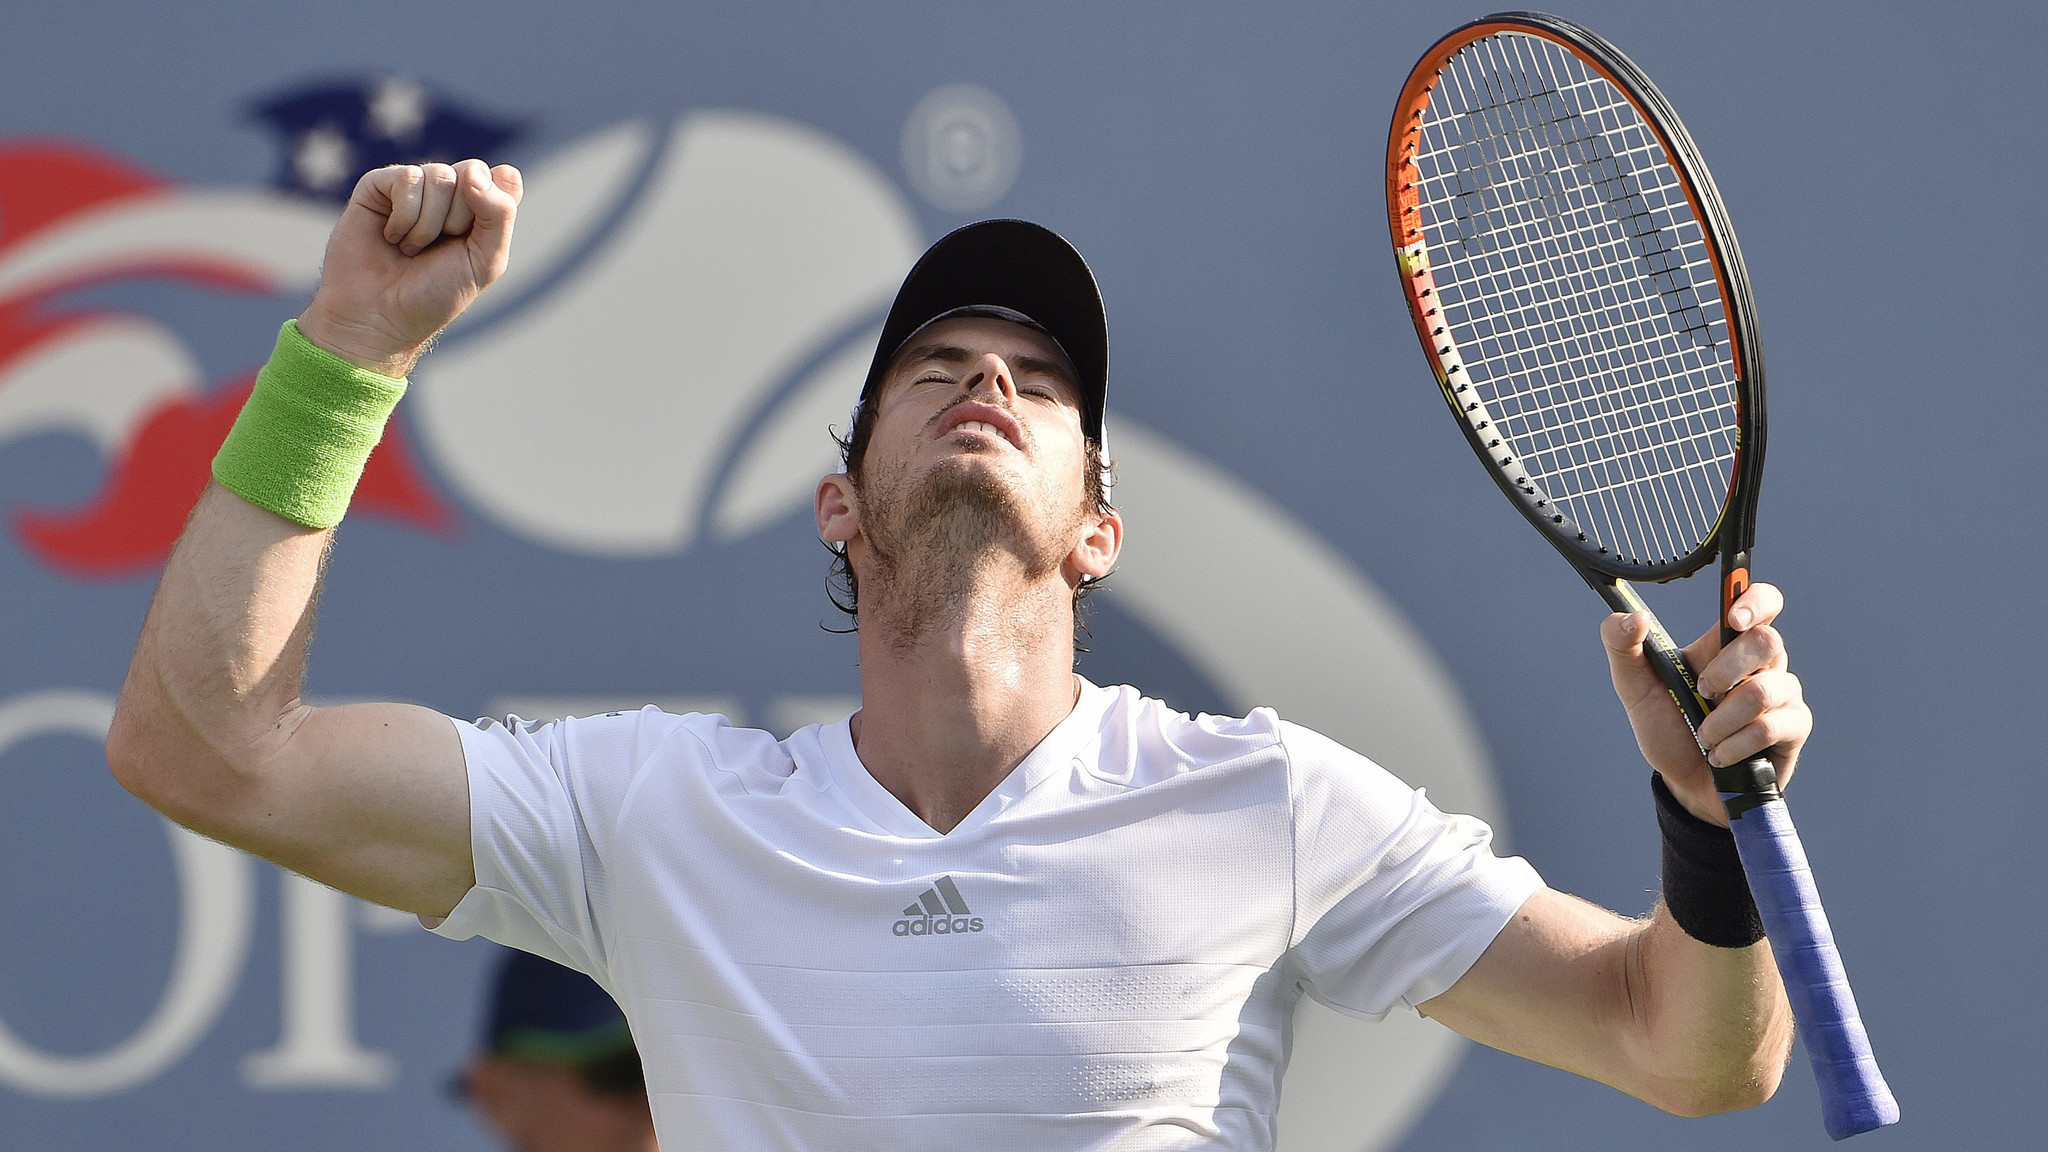 Andy Murray looks more like himself in win over Jo-Wilfried Tsonga